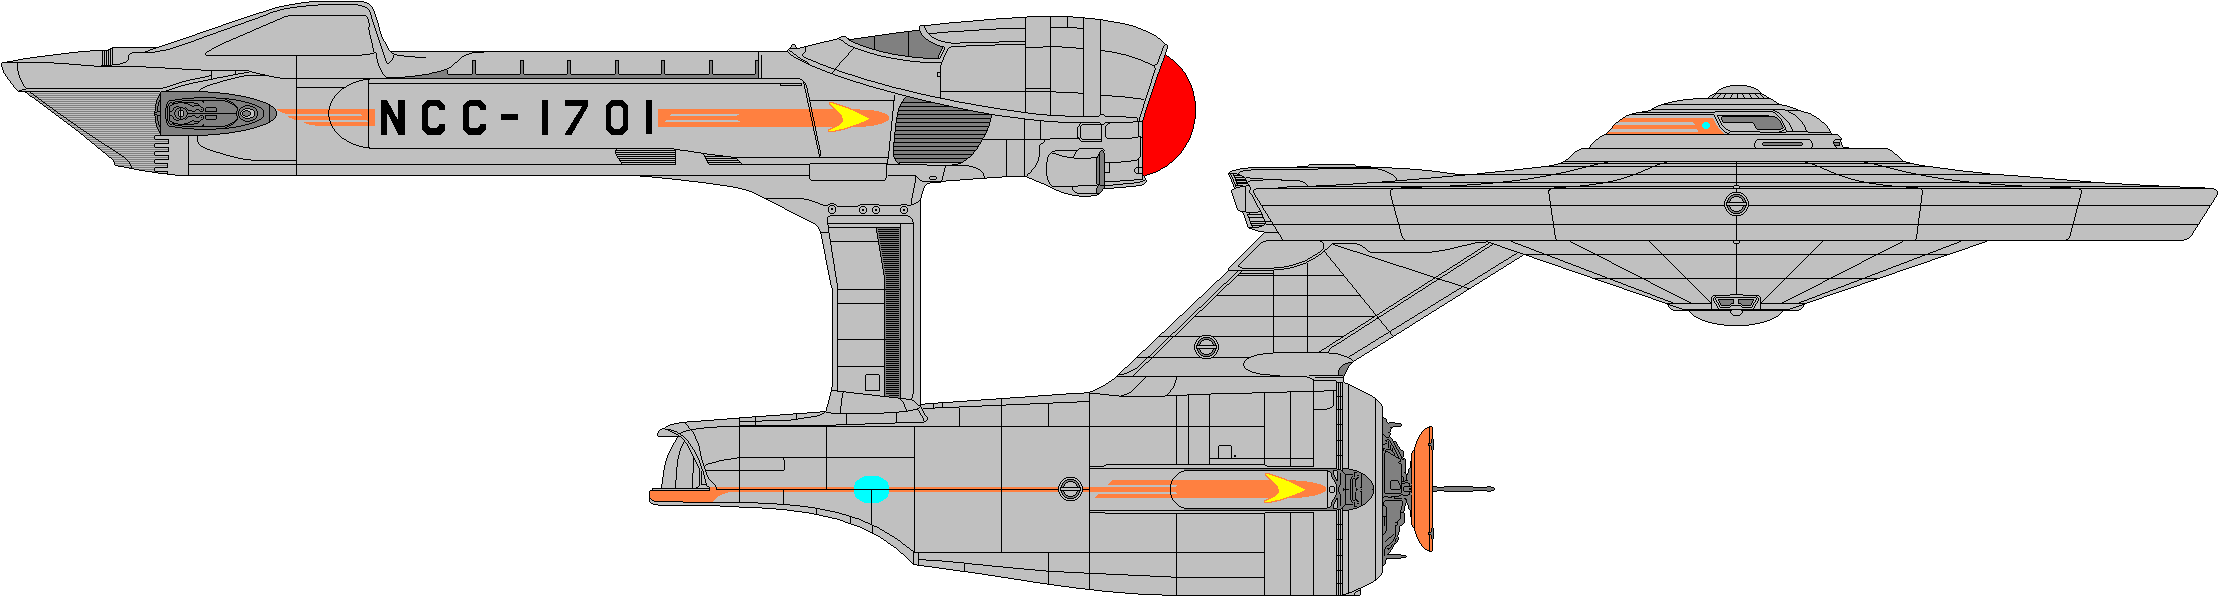 uss enterprise diagram mk consumer unit wiring ncc 1701 starship star trek the bad robot